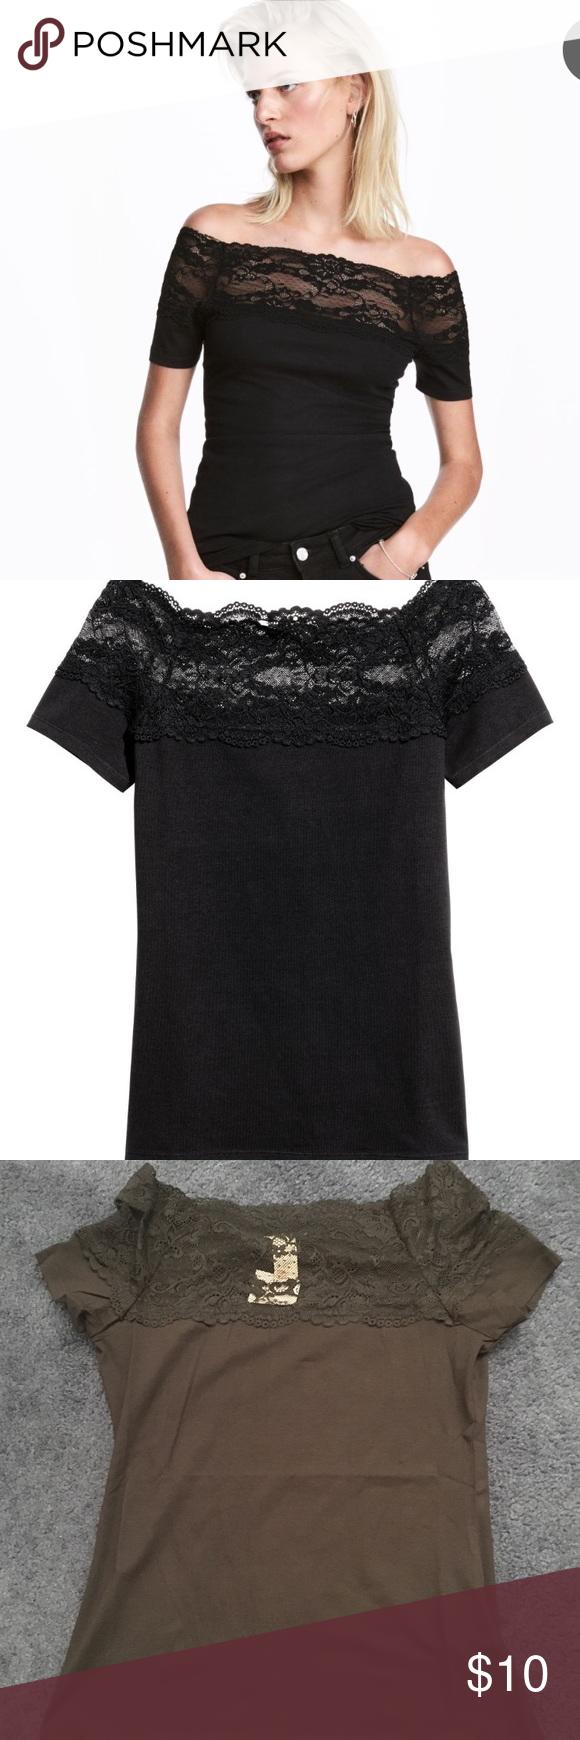 7c8037f446d0ca Off shoulder lace top H&m off shoulder lace top. 95% cotton 5% spandex H&M  Tops Tees - Short Sleeve